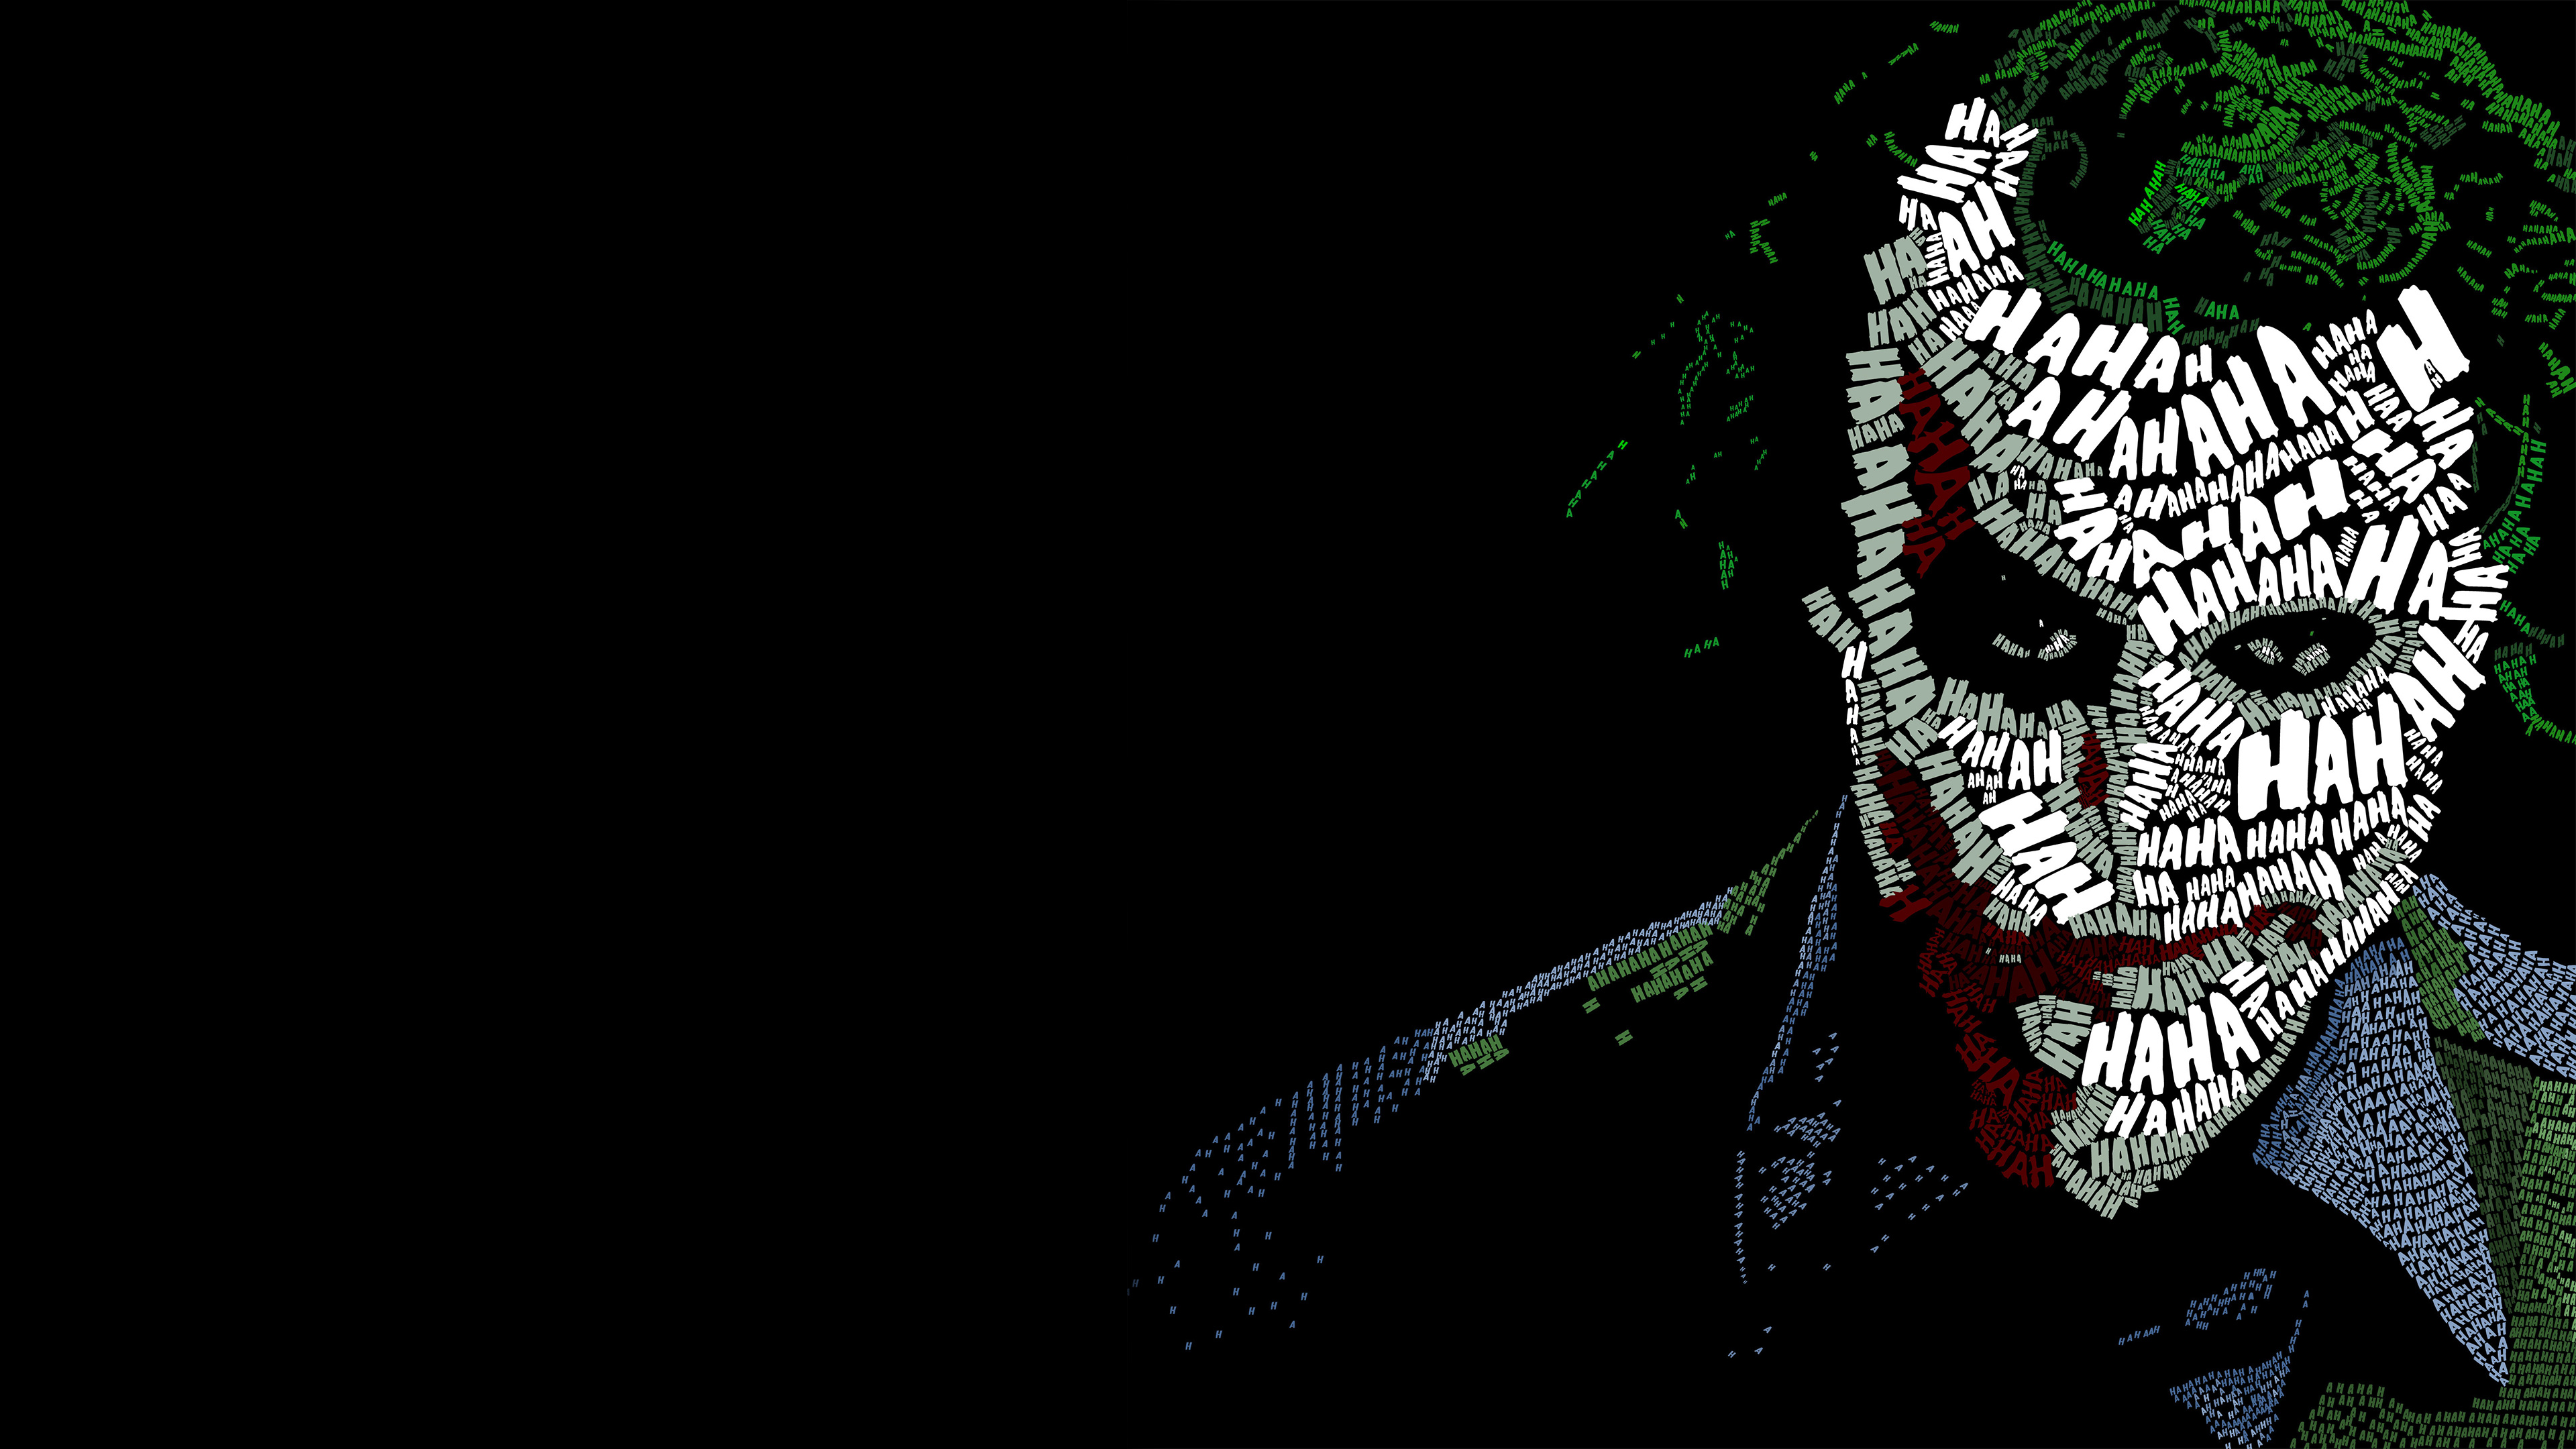 2048x2048 Joker Typography Ipad Air HD 4k Wallpapers, Images